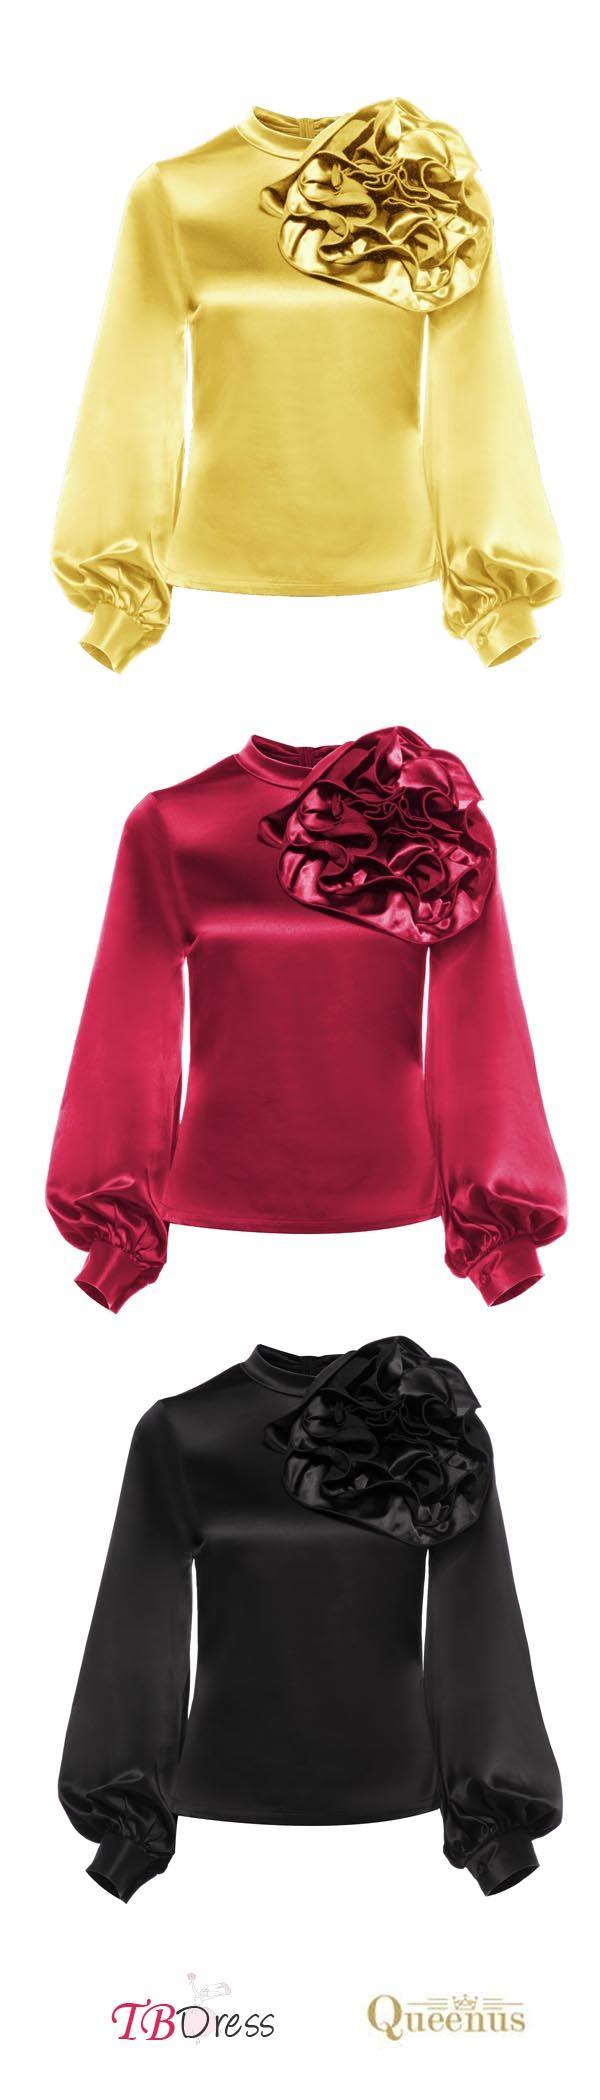 Look - Fashion Newsdiy bow back t shirt video